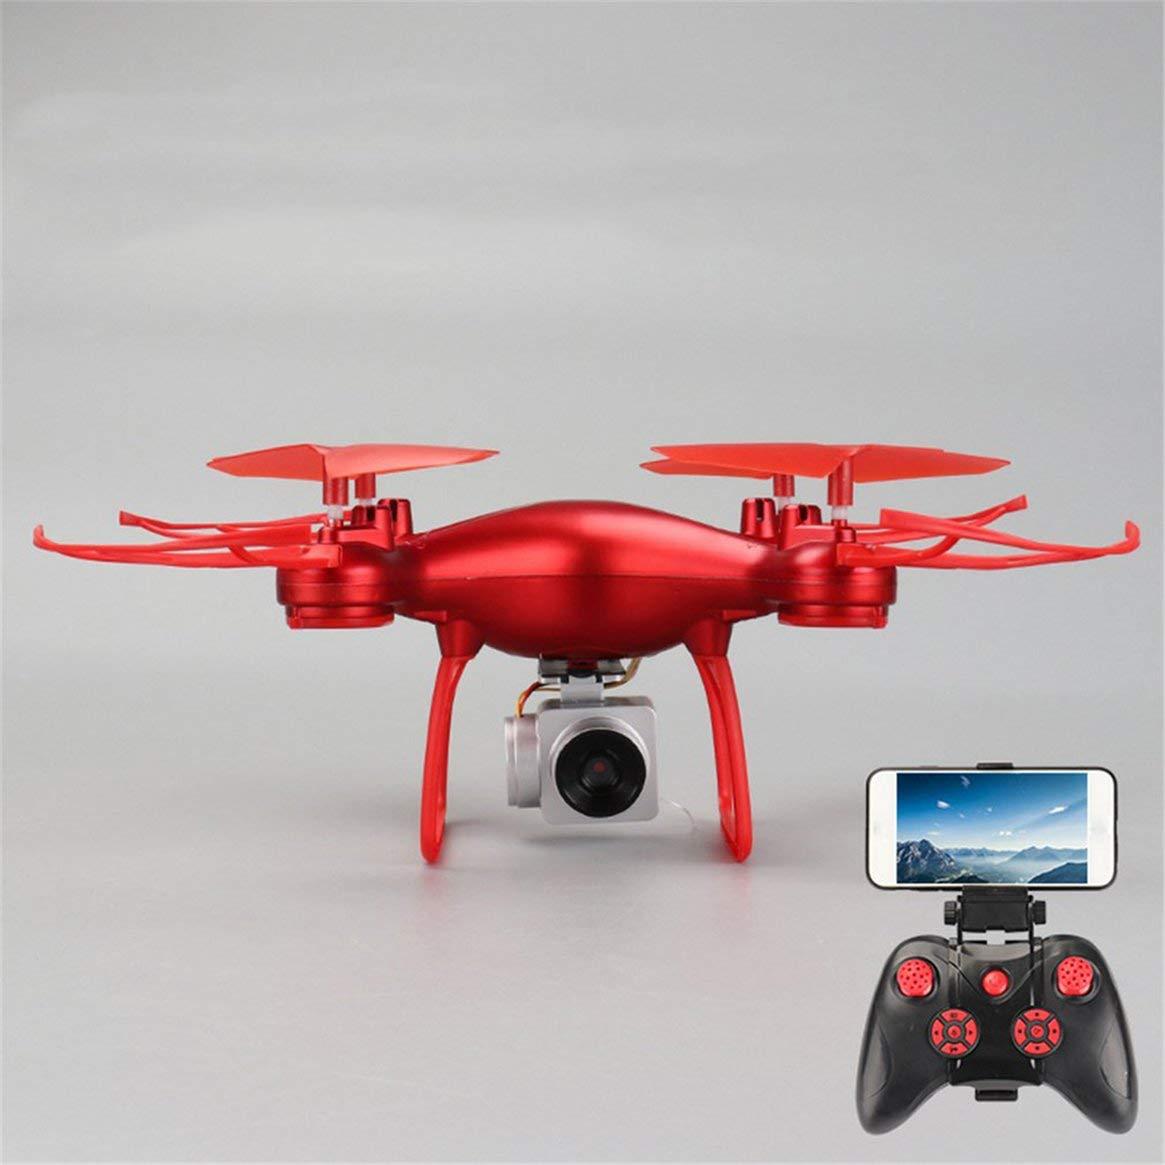 Delicacydex 008 Smart Selfie RC Quadrocopter-Drohne mit 720P-Live-Video-HD-Kamera Höhenstand Headless-Modus One Key Take-Off RTF - Weiß